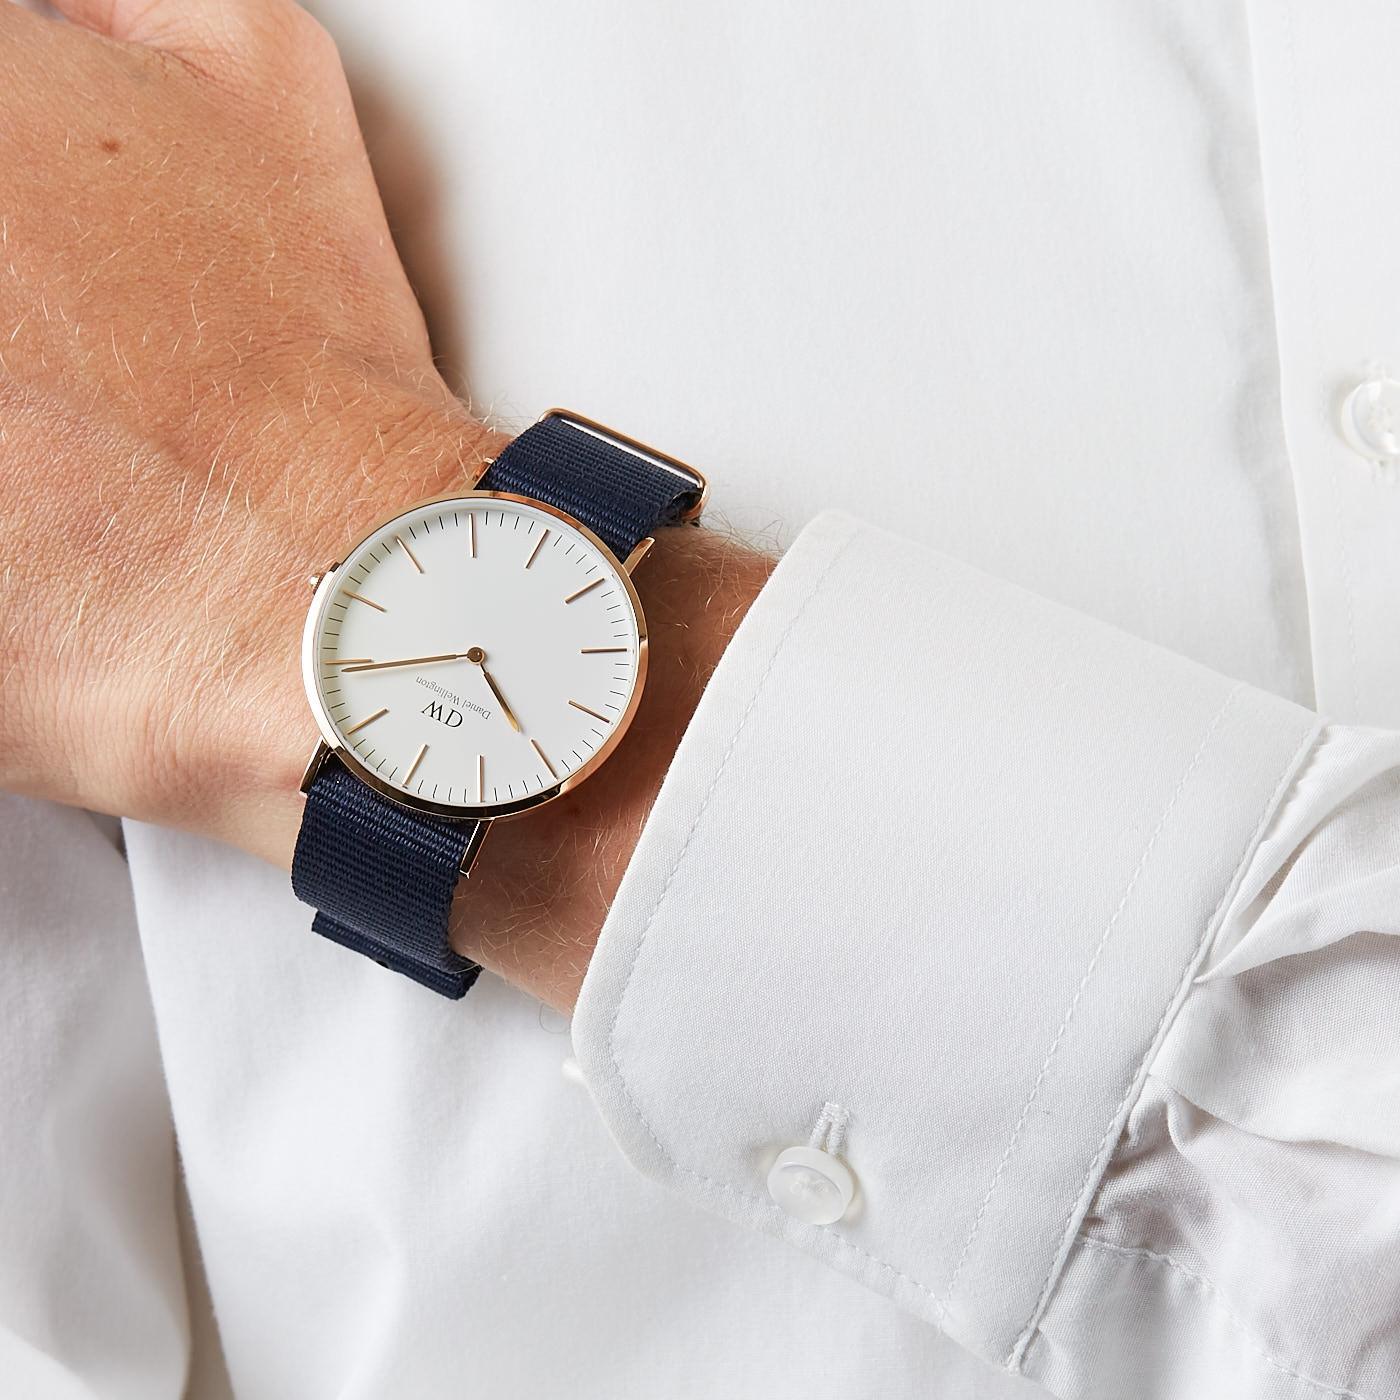 724c92c96925 Daniel Wellington Classic watch DW00100275 - Watches